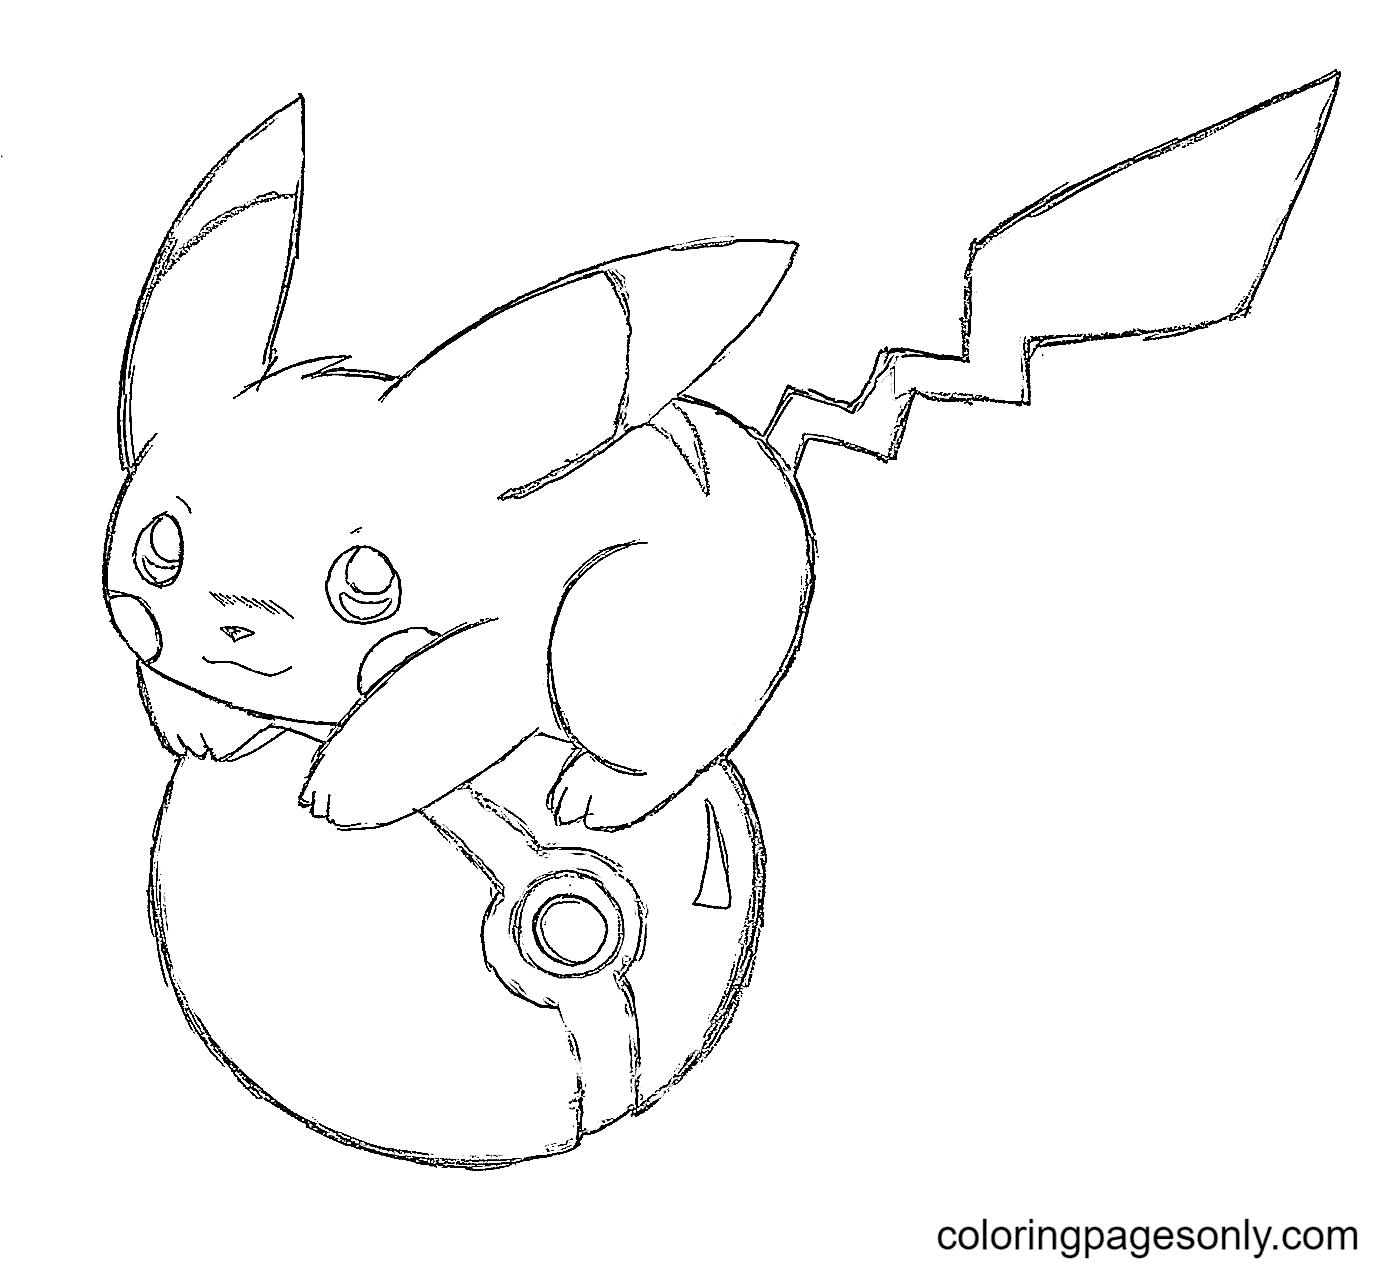 Cute Pokemon Pikachu Coloring Page